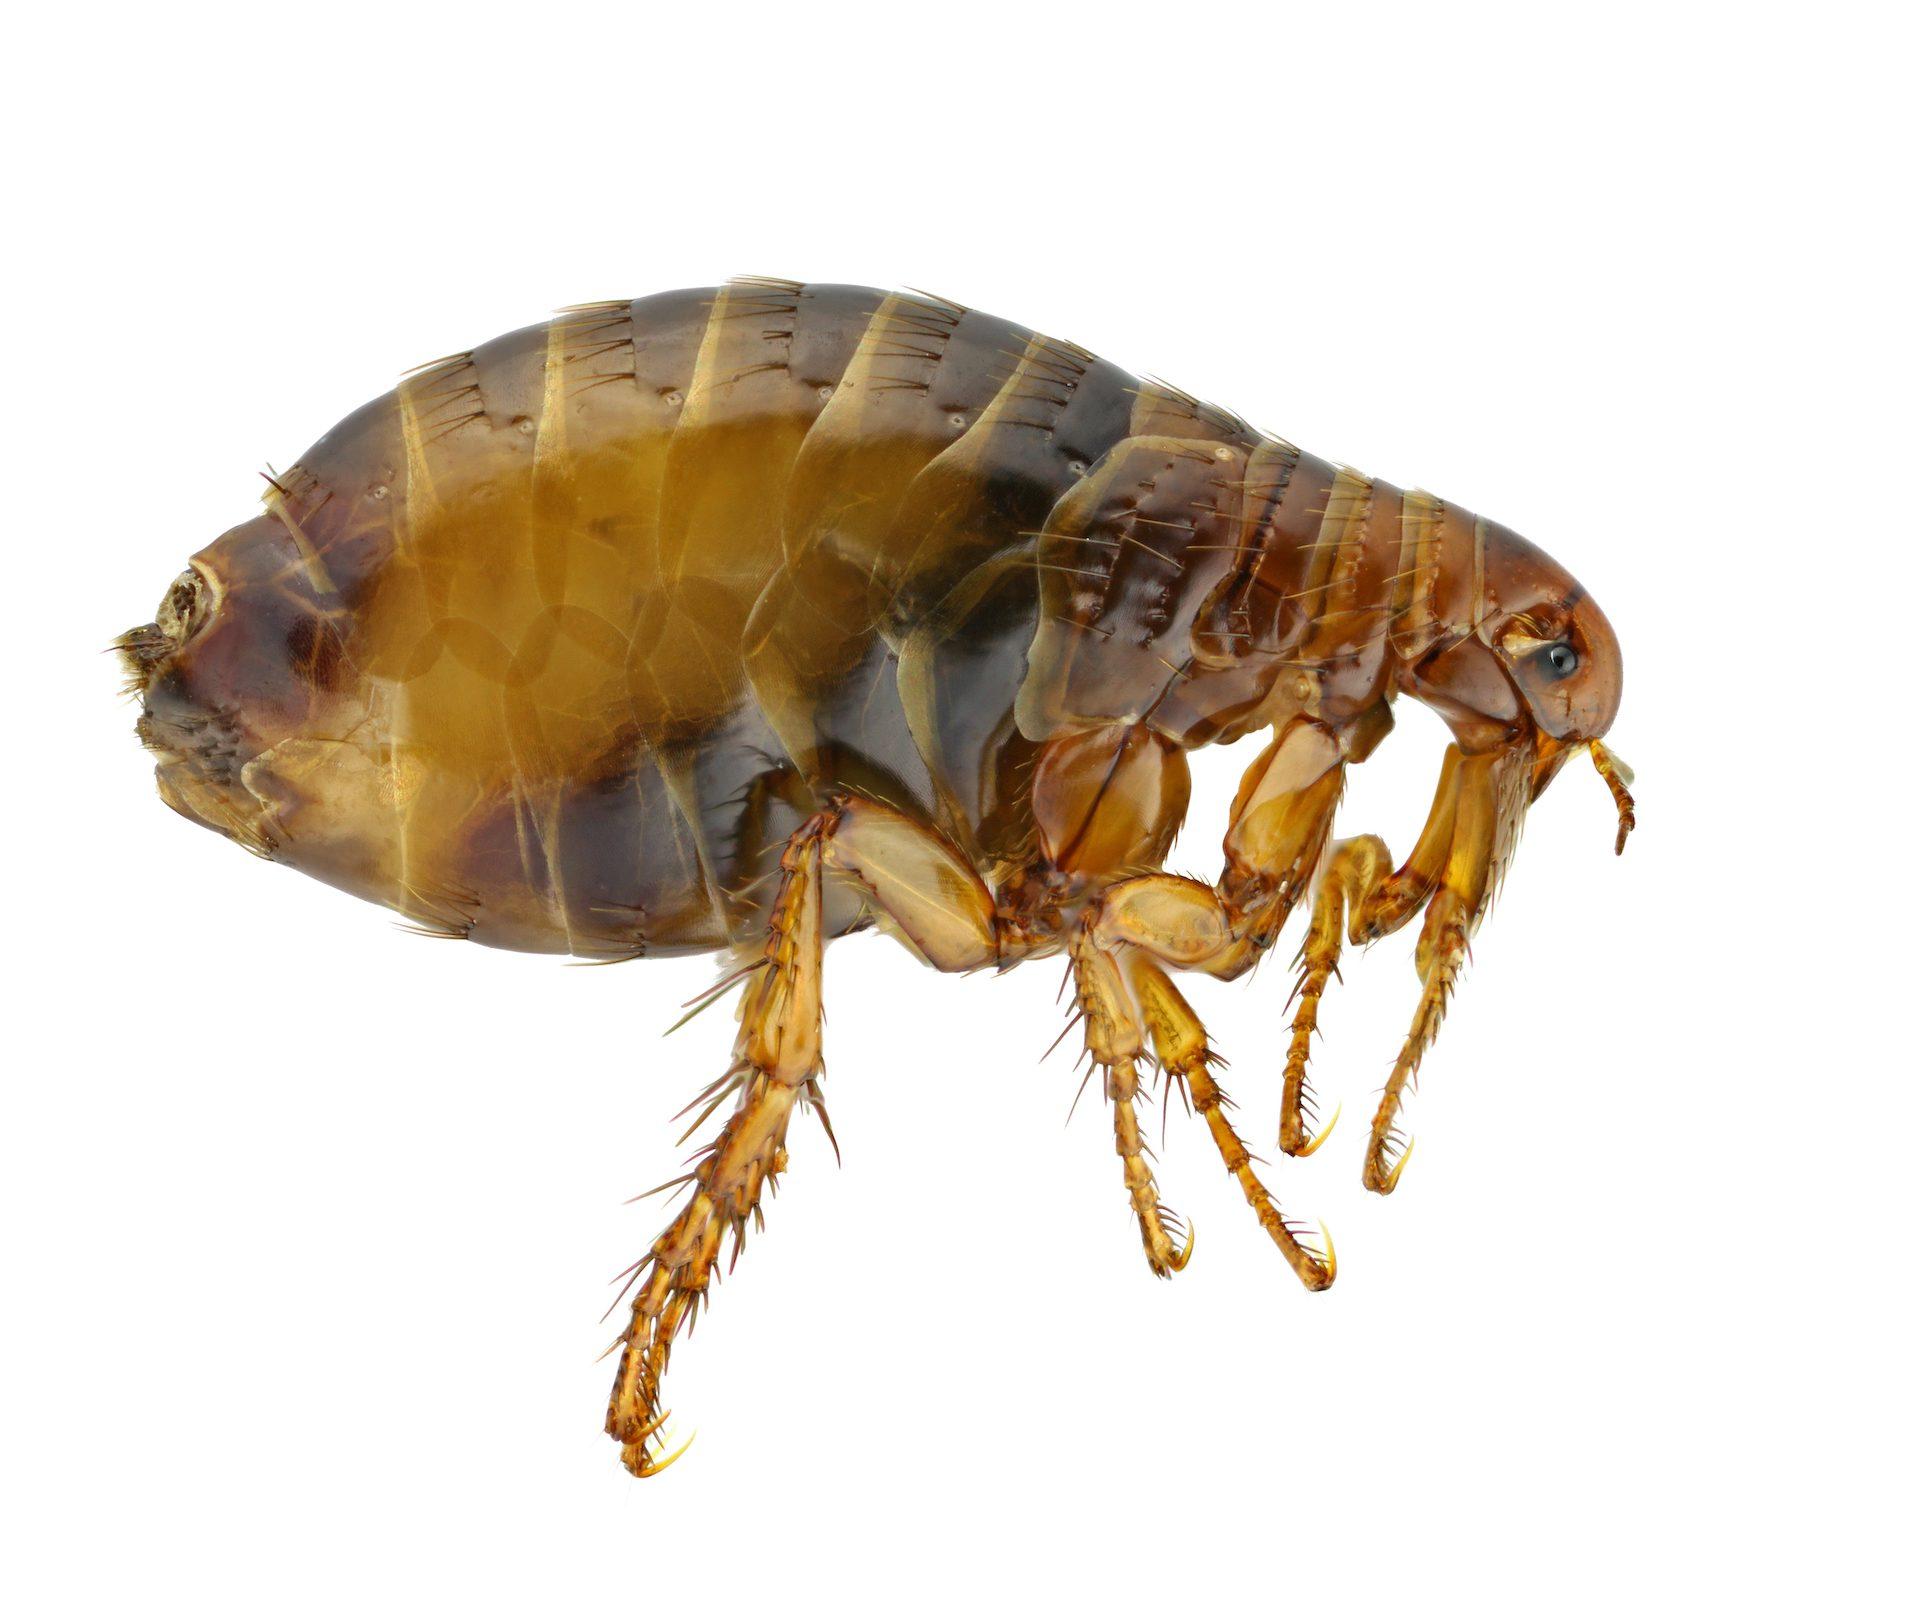 Pest Control in Nashville - Preventative Pest Control - Certified Pest Control